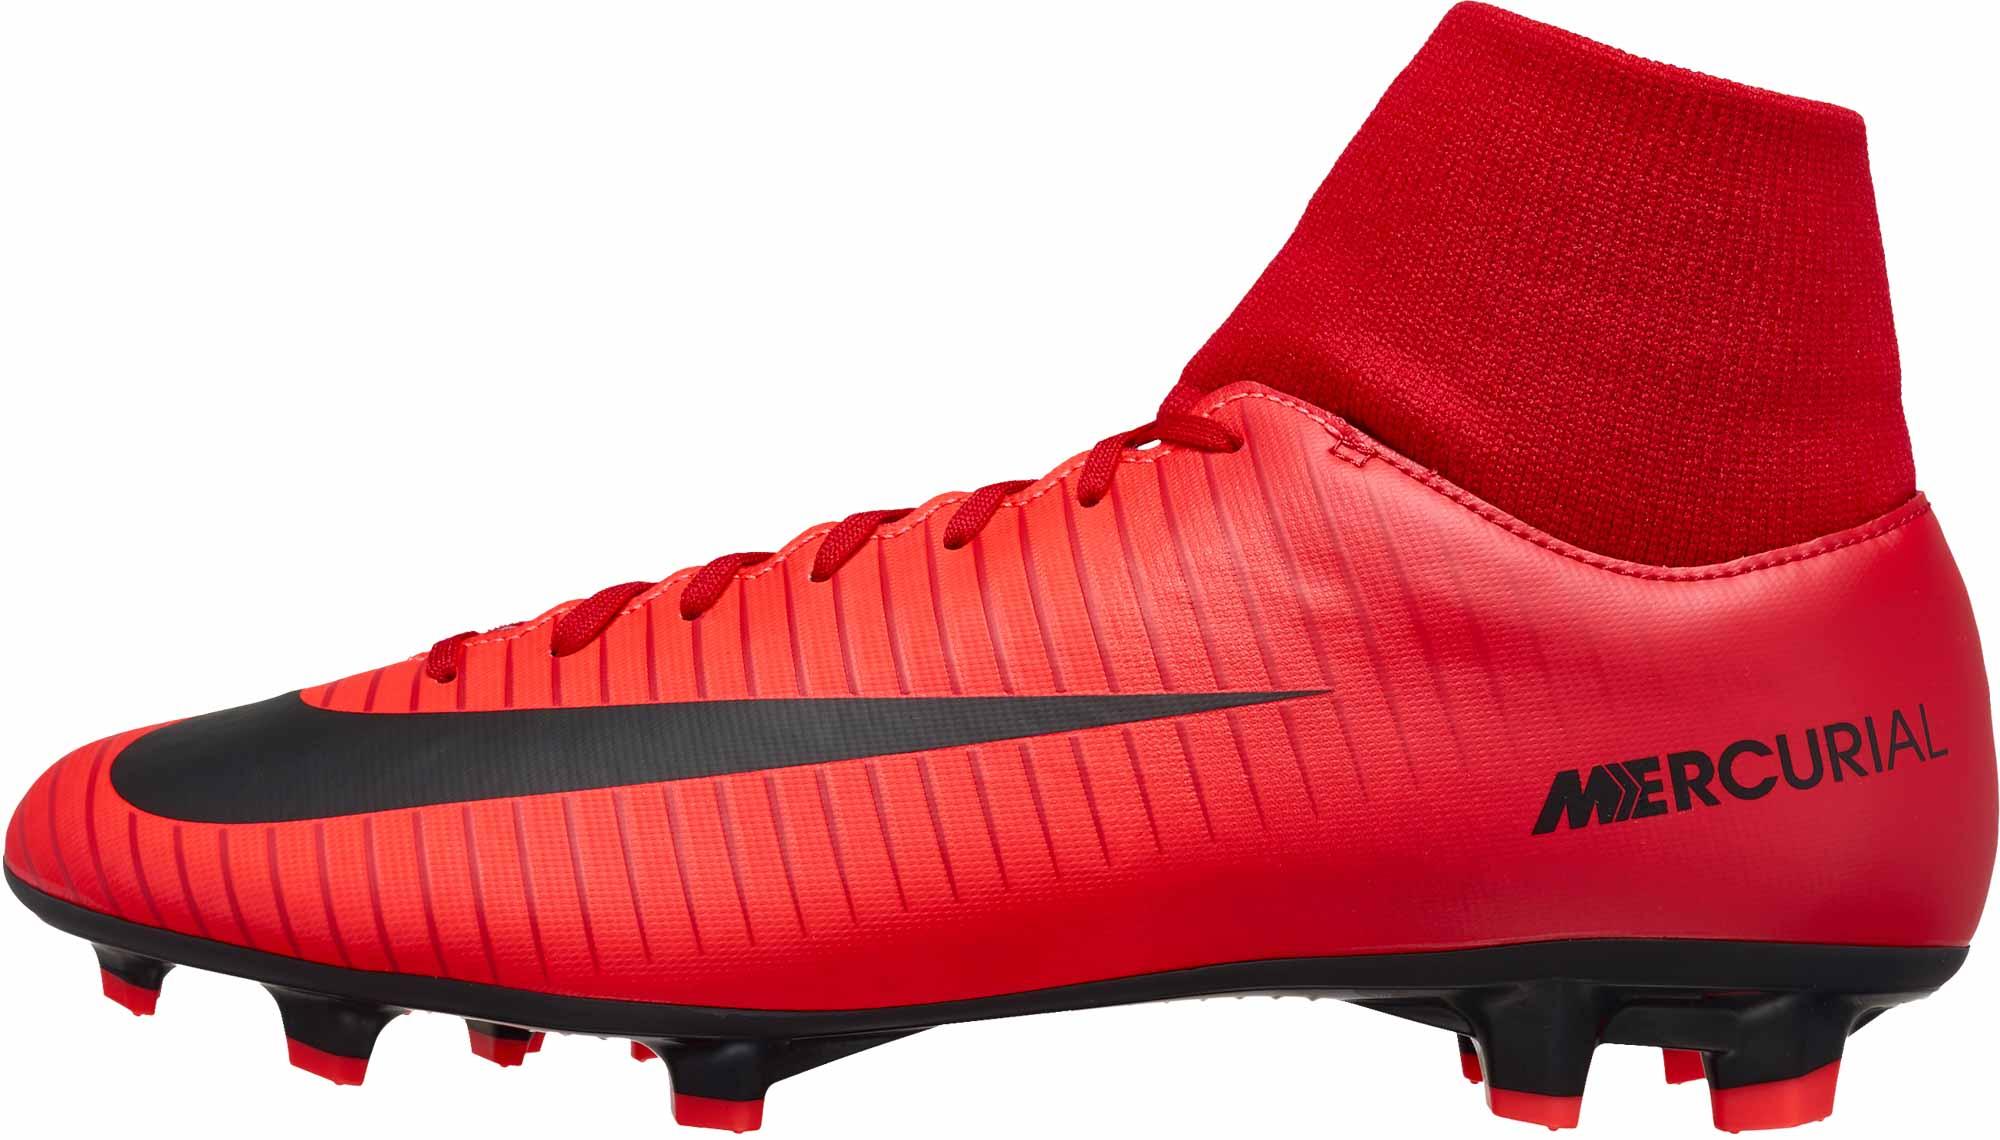 low priced c84c6 6e9ca Nike Mercurial Victory VI DF FG – University Red Black